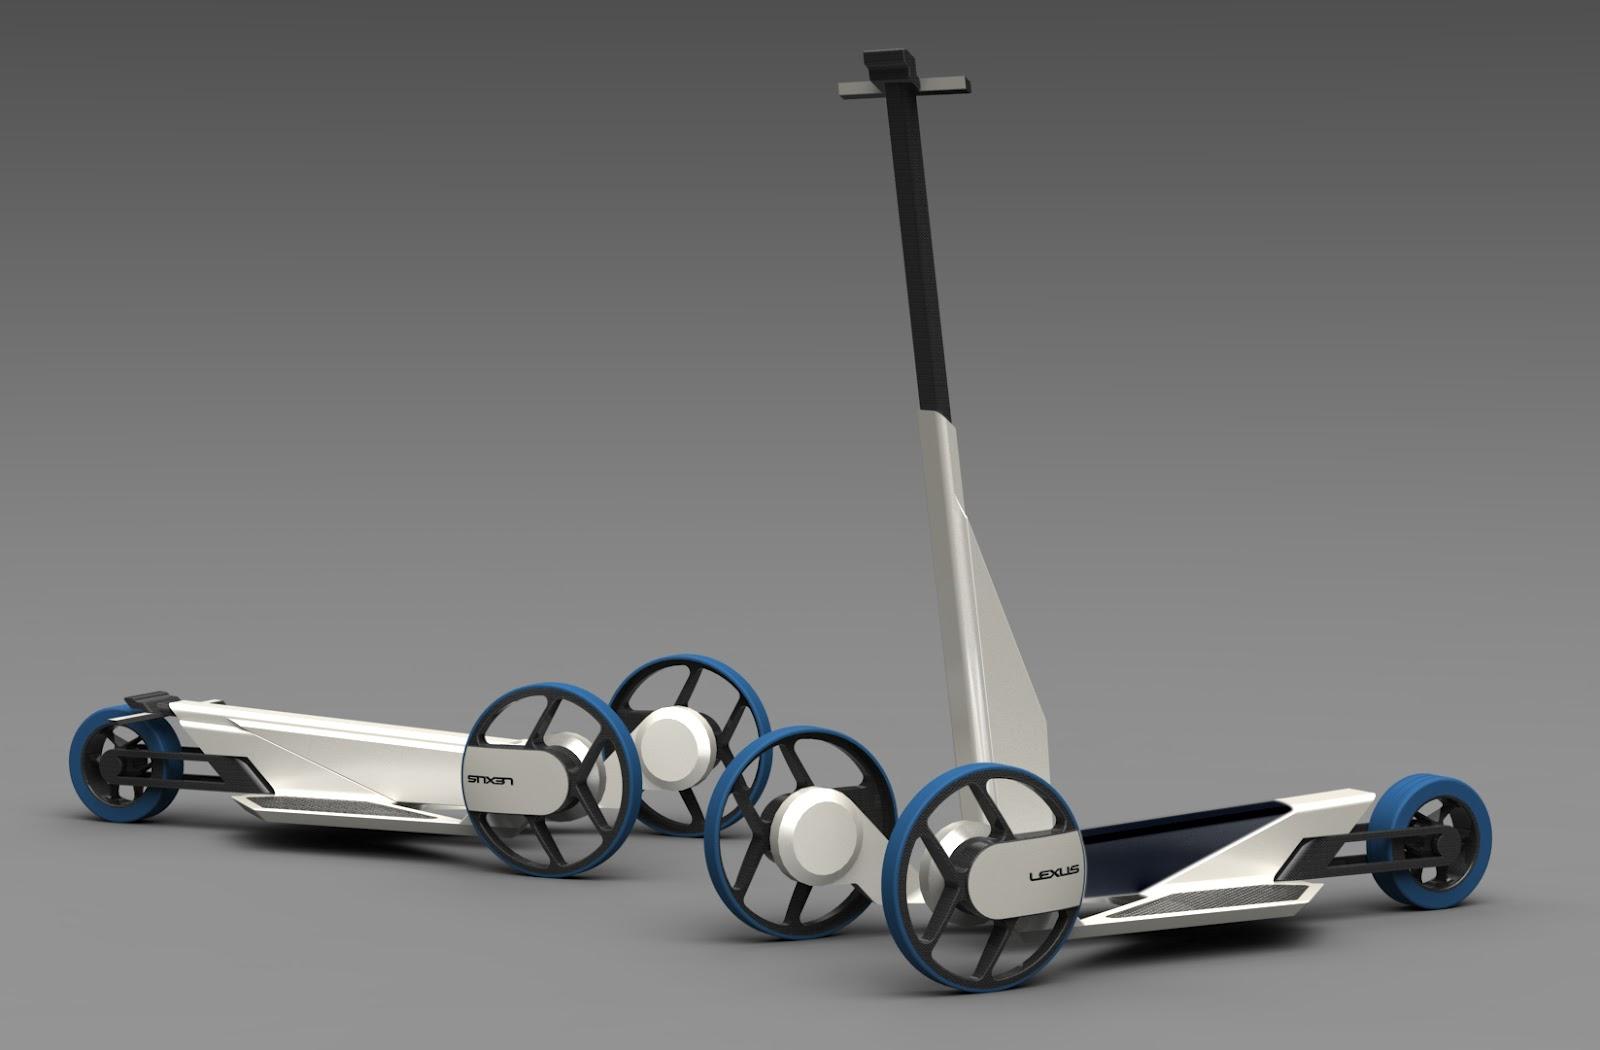 ziman konstantin h2scoot lexus hydrogen scooter. Black Bedroom Furniture Sets. Home Design Ideas